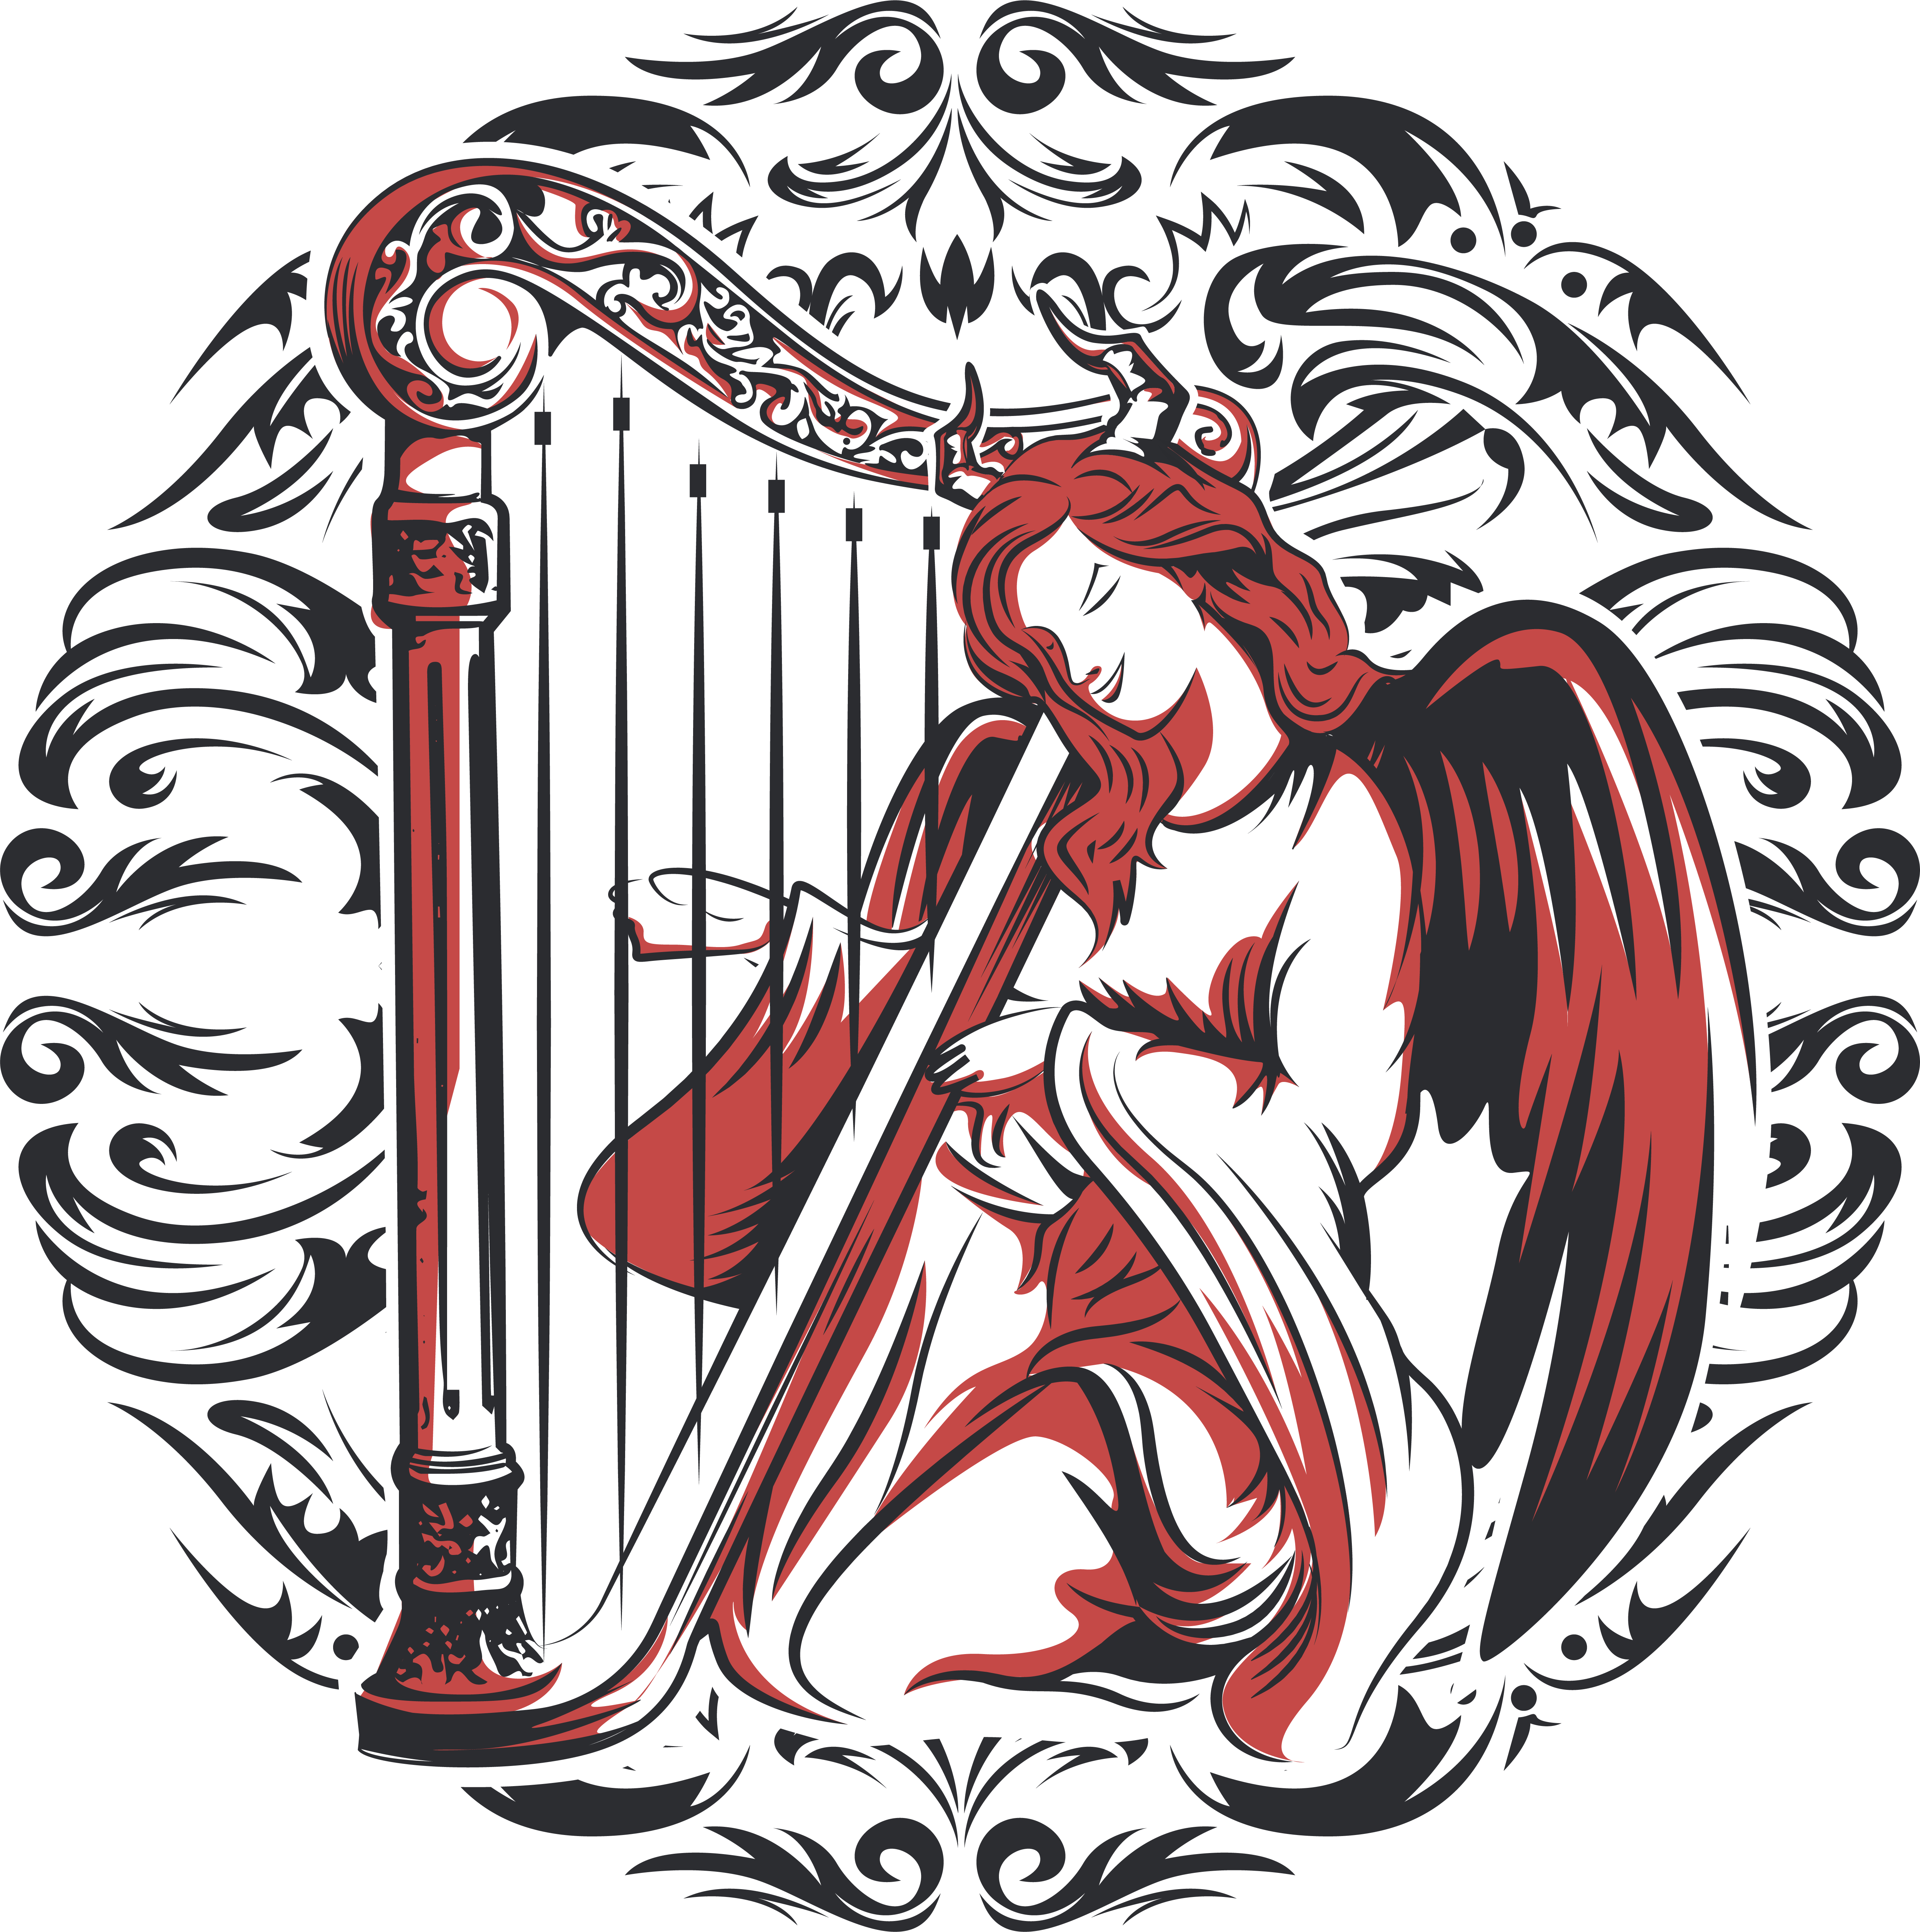 Design a Catholic art themed streetwear logo